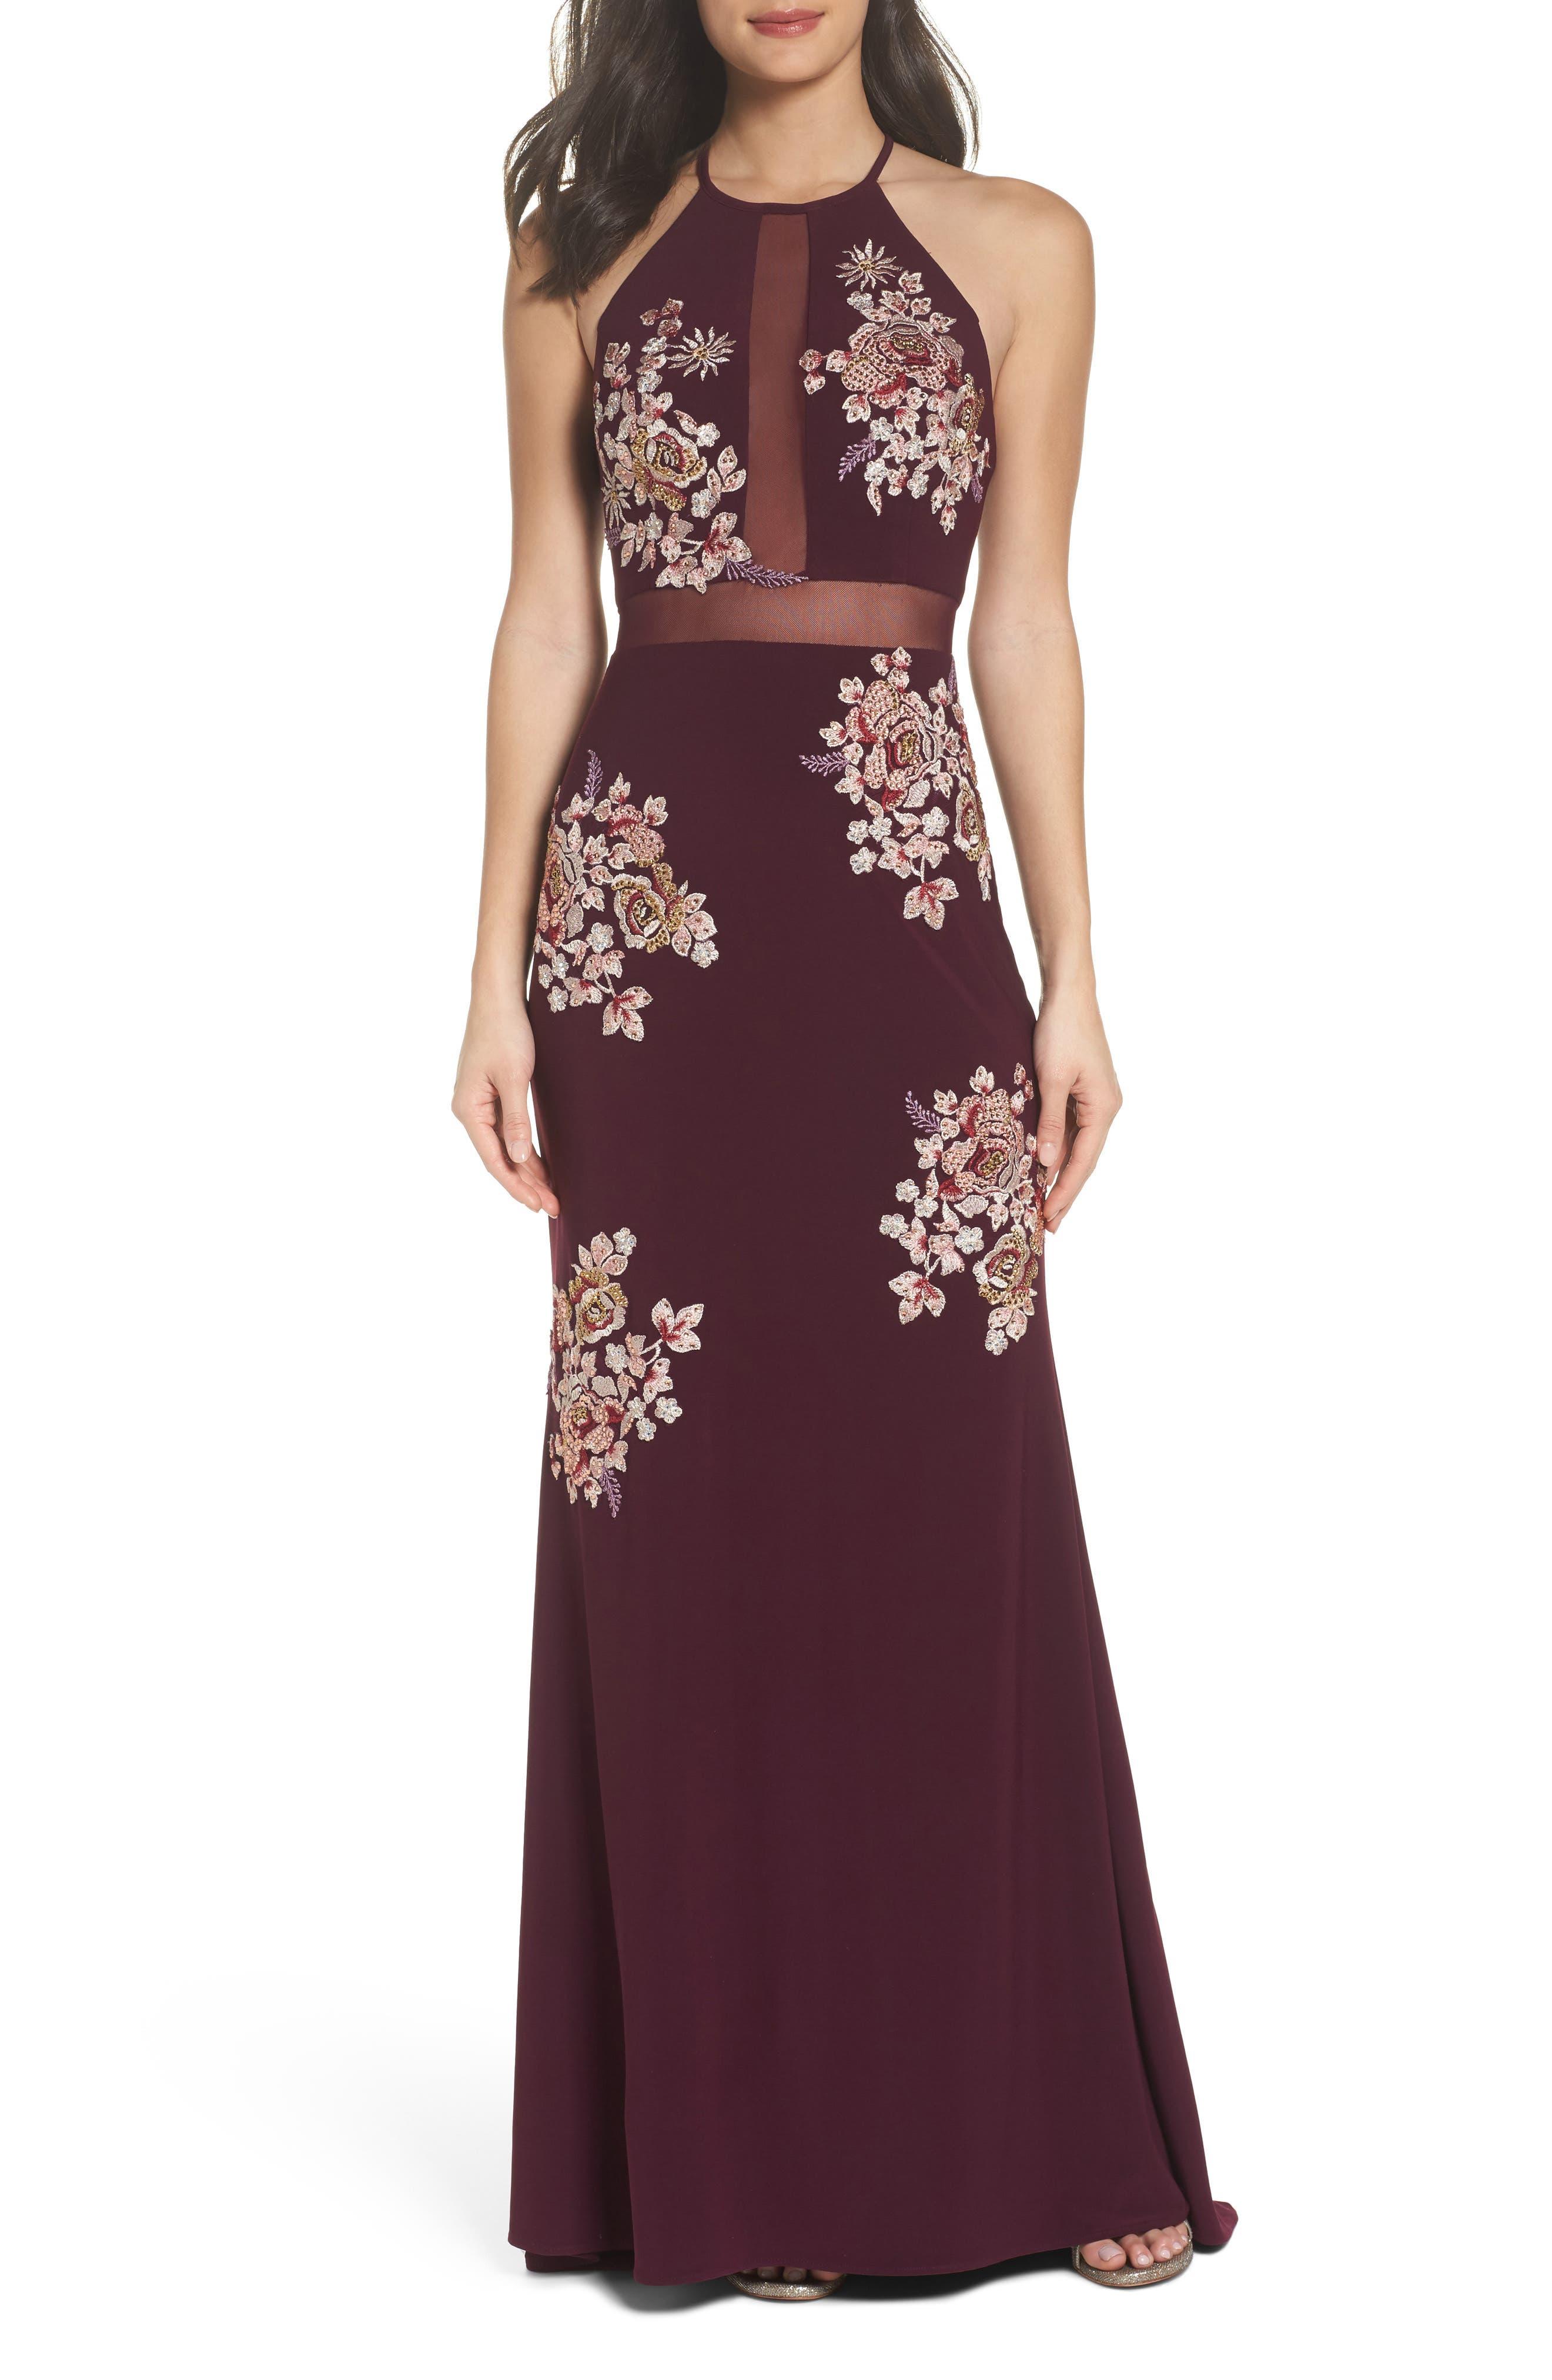 Embellished Floral Halter Gown,                             Main thumbnail 1, color,                             930